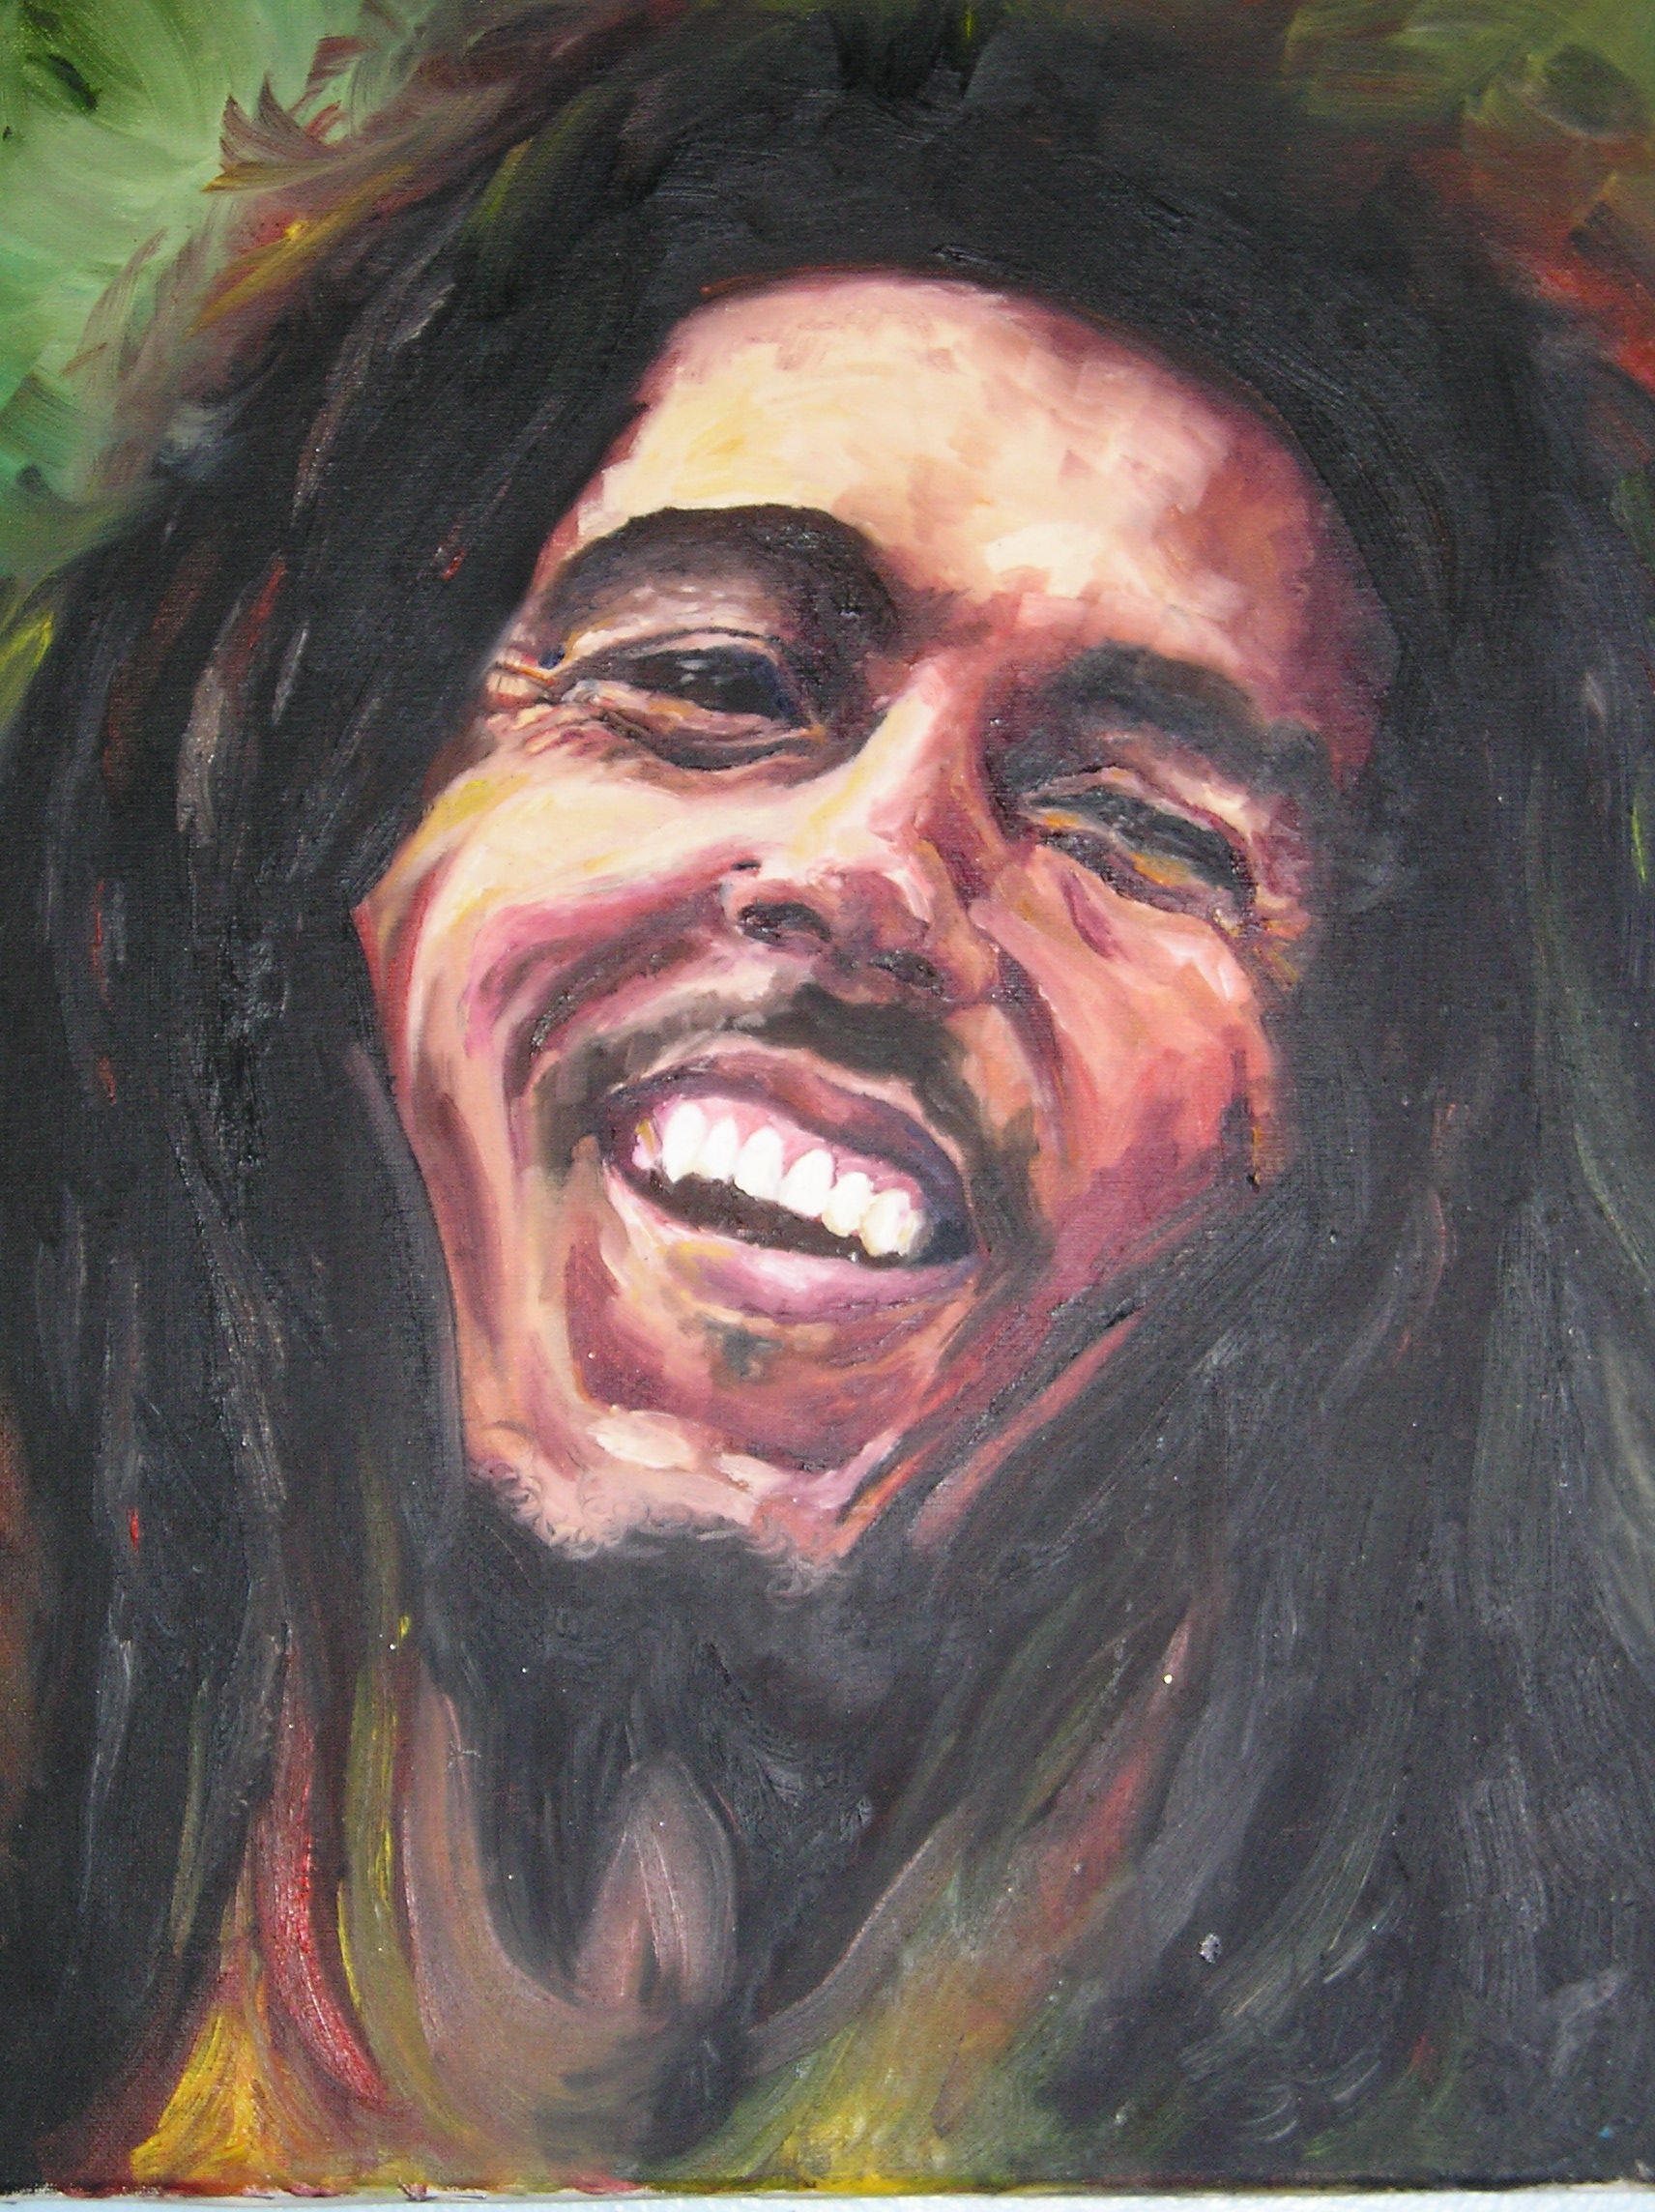 Bob Marley by PennyLane1024 title=